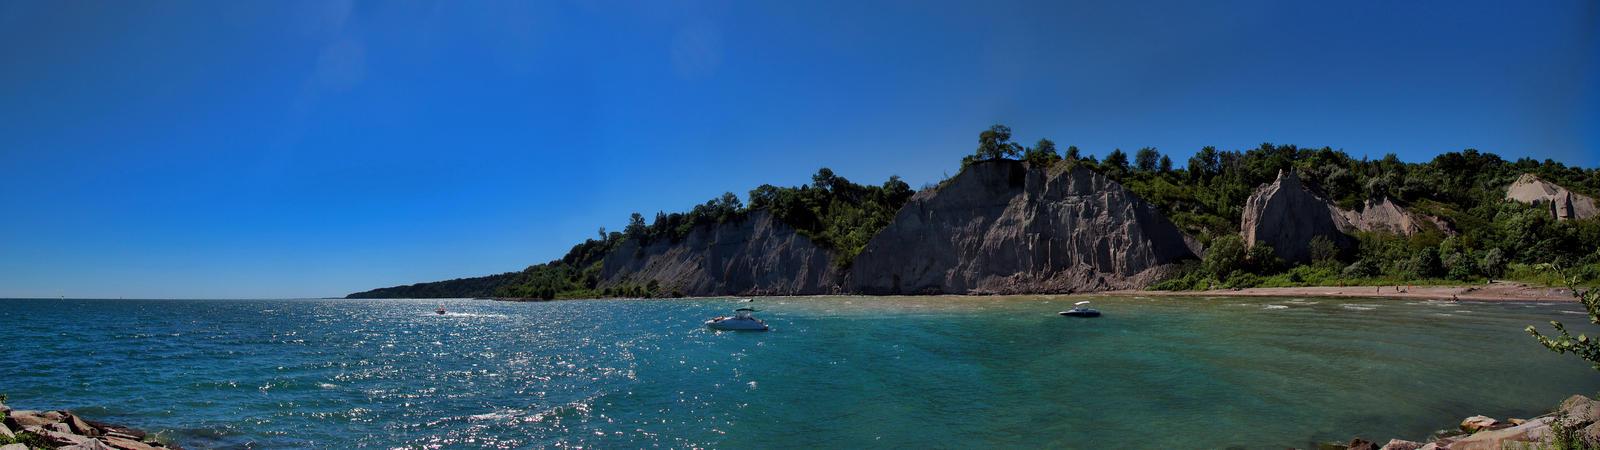 Bluffer's Cliffs by KMourzenko